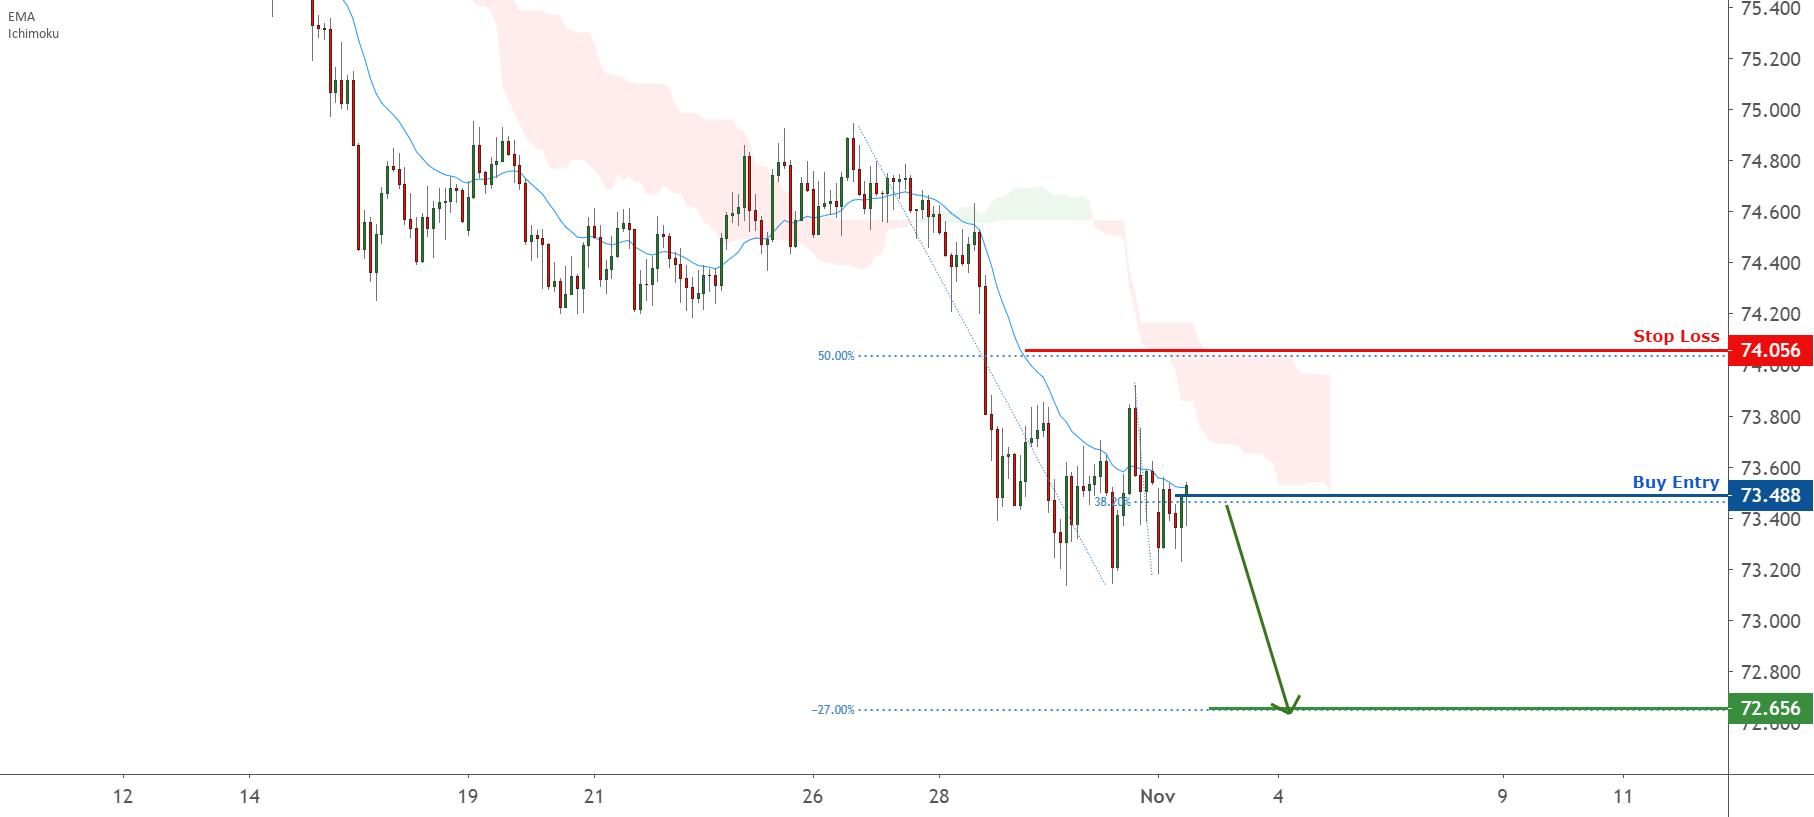 Possible trend shift in AUDJPY – going short for FX:AUDJPY by FXCM